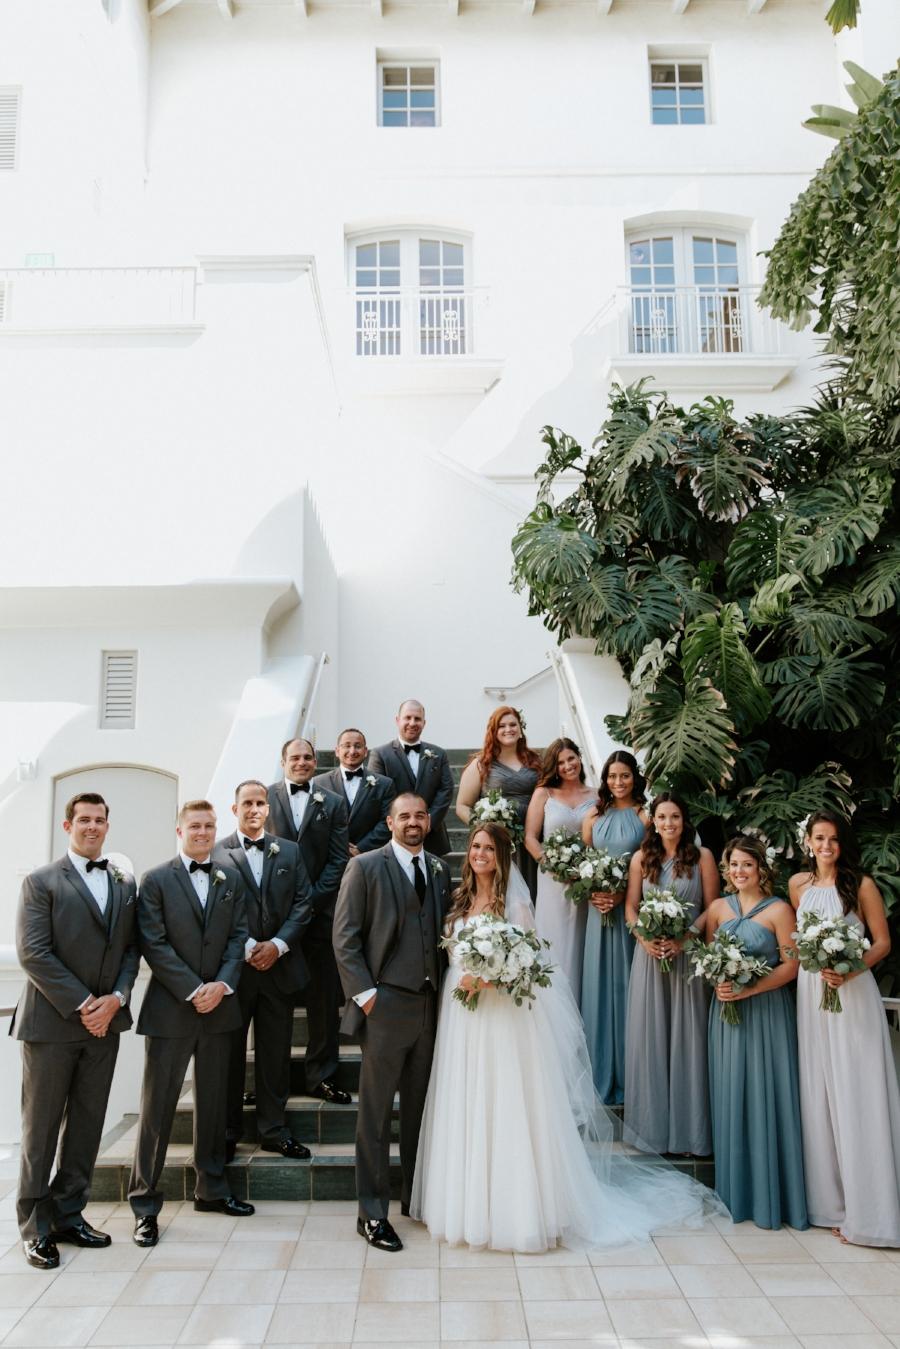 Elegant Coastal Boho Wedding | Park Hyatt Aviara | San Diego Wedding | Tiana Loyd-Michelle Garibay Events | Paige Nelson Photography